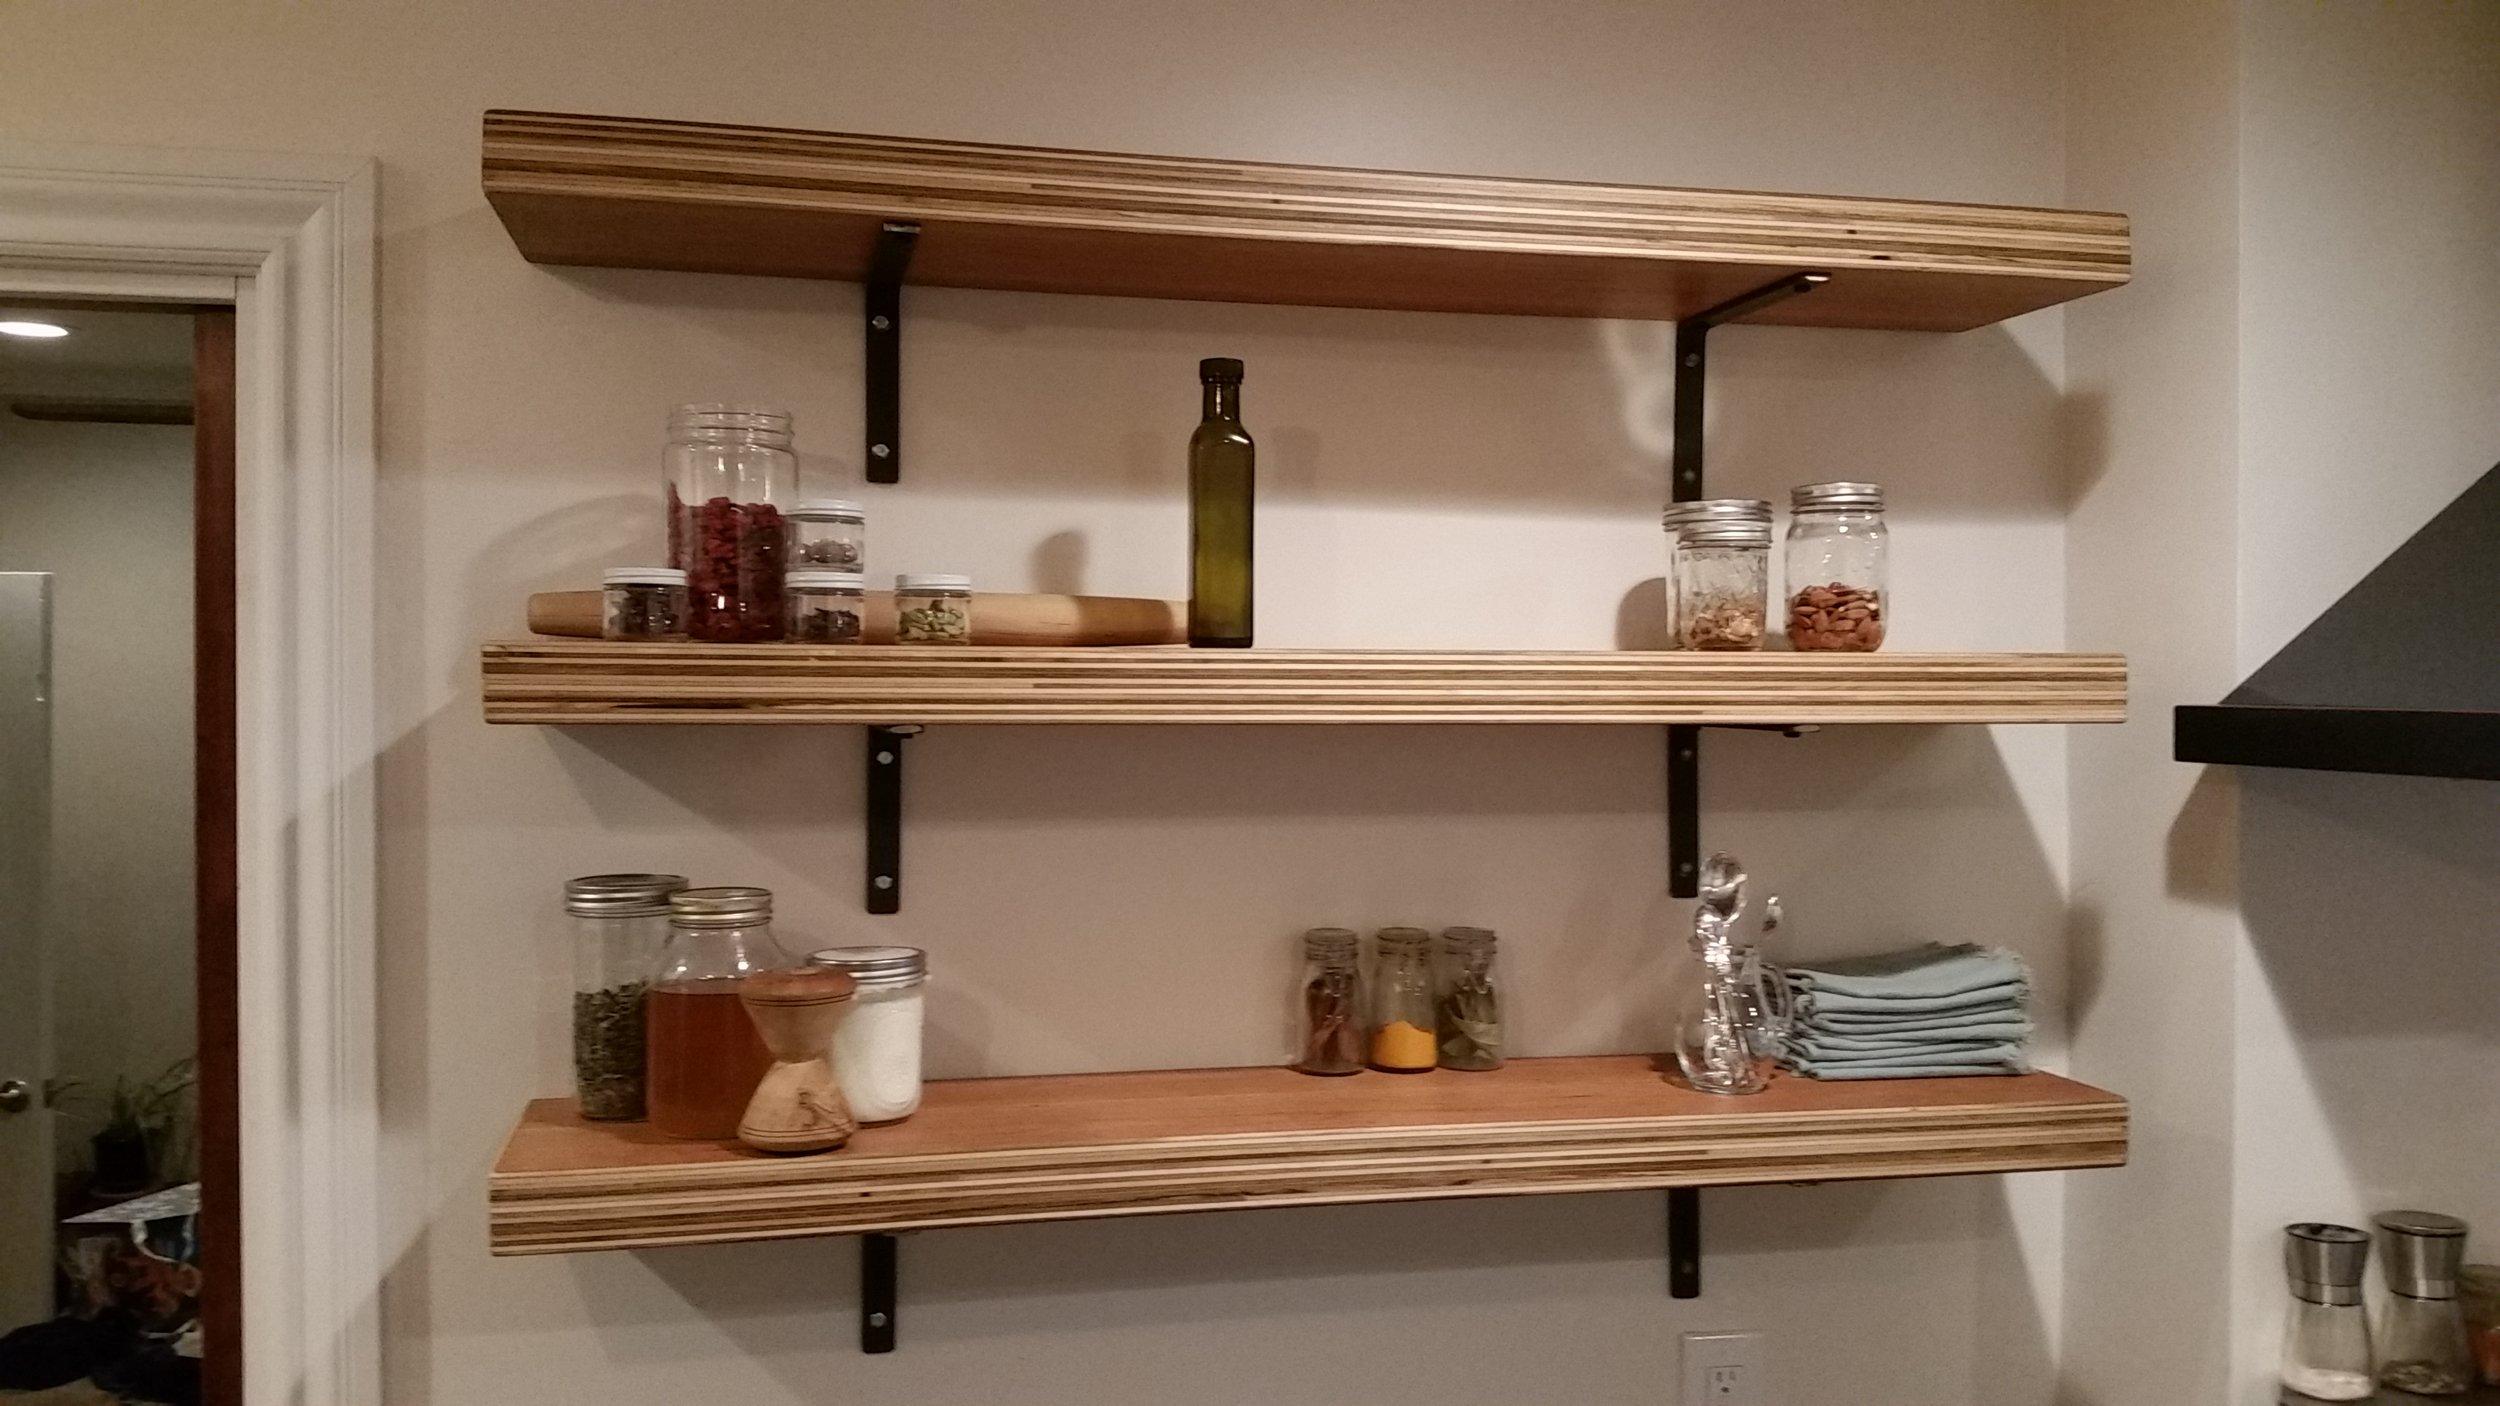 Cherry plywood kitchen shelves.